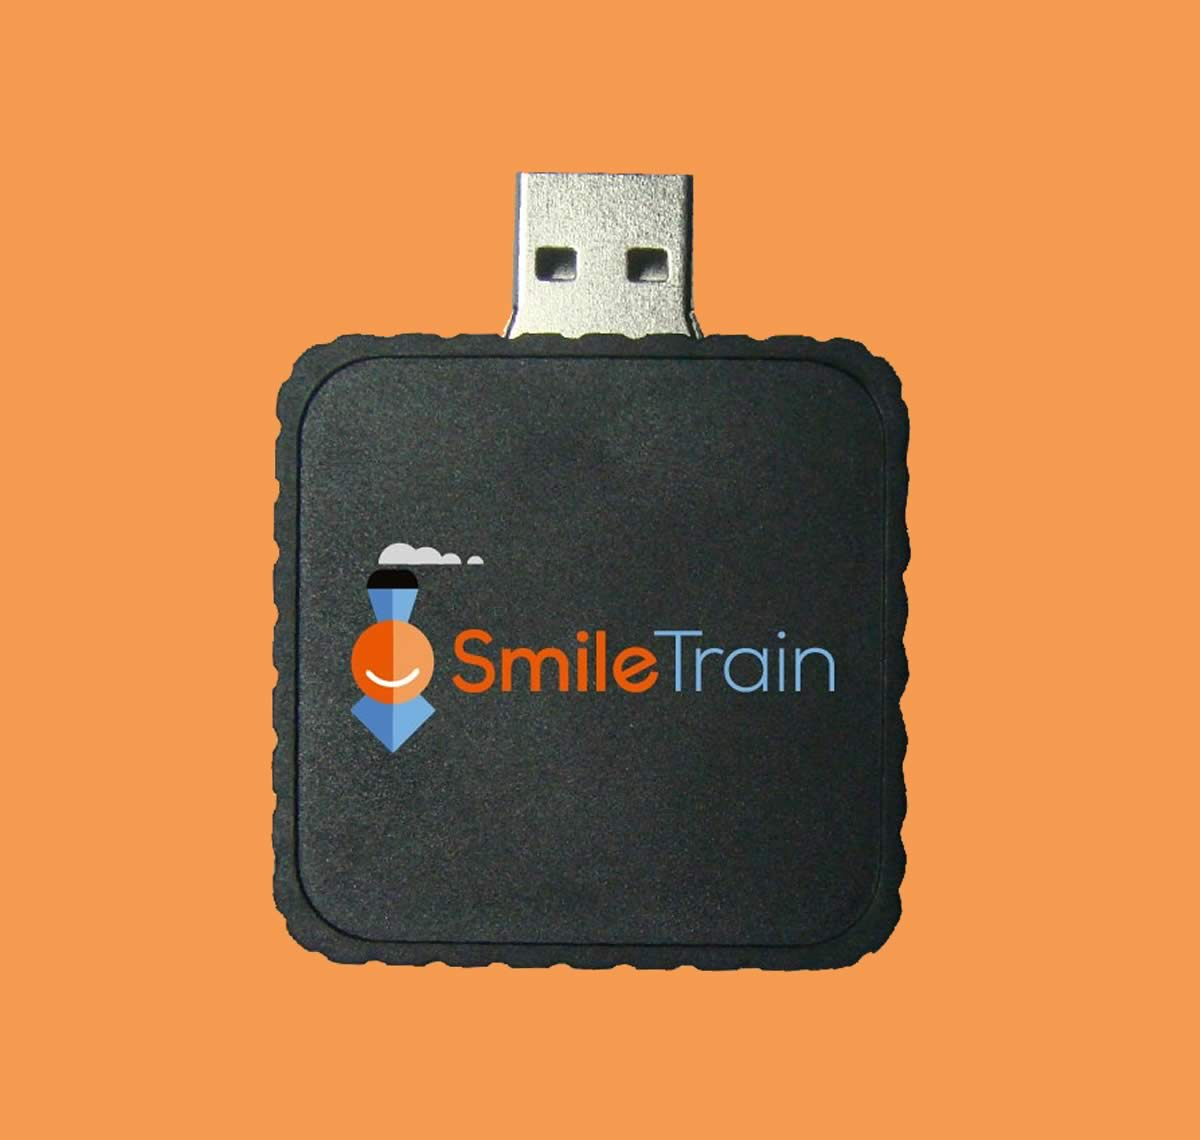 SmileTrain flashdrive